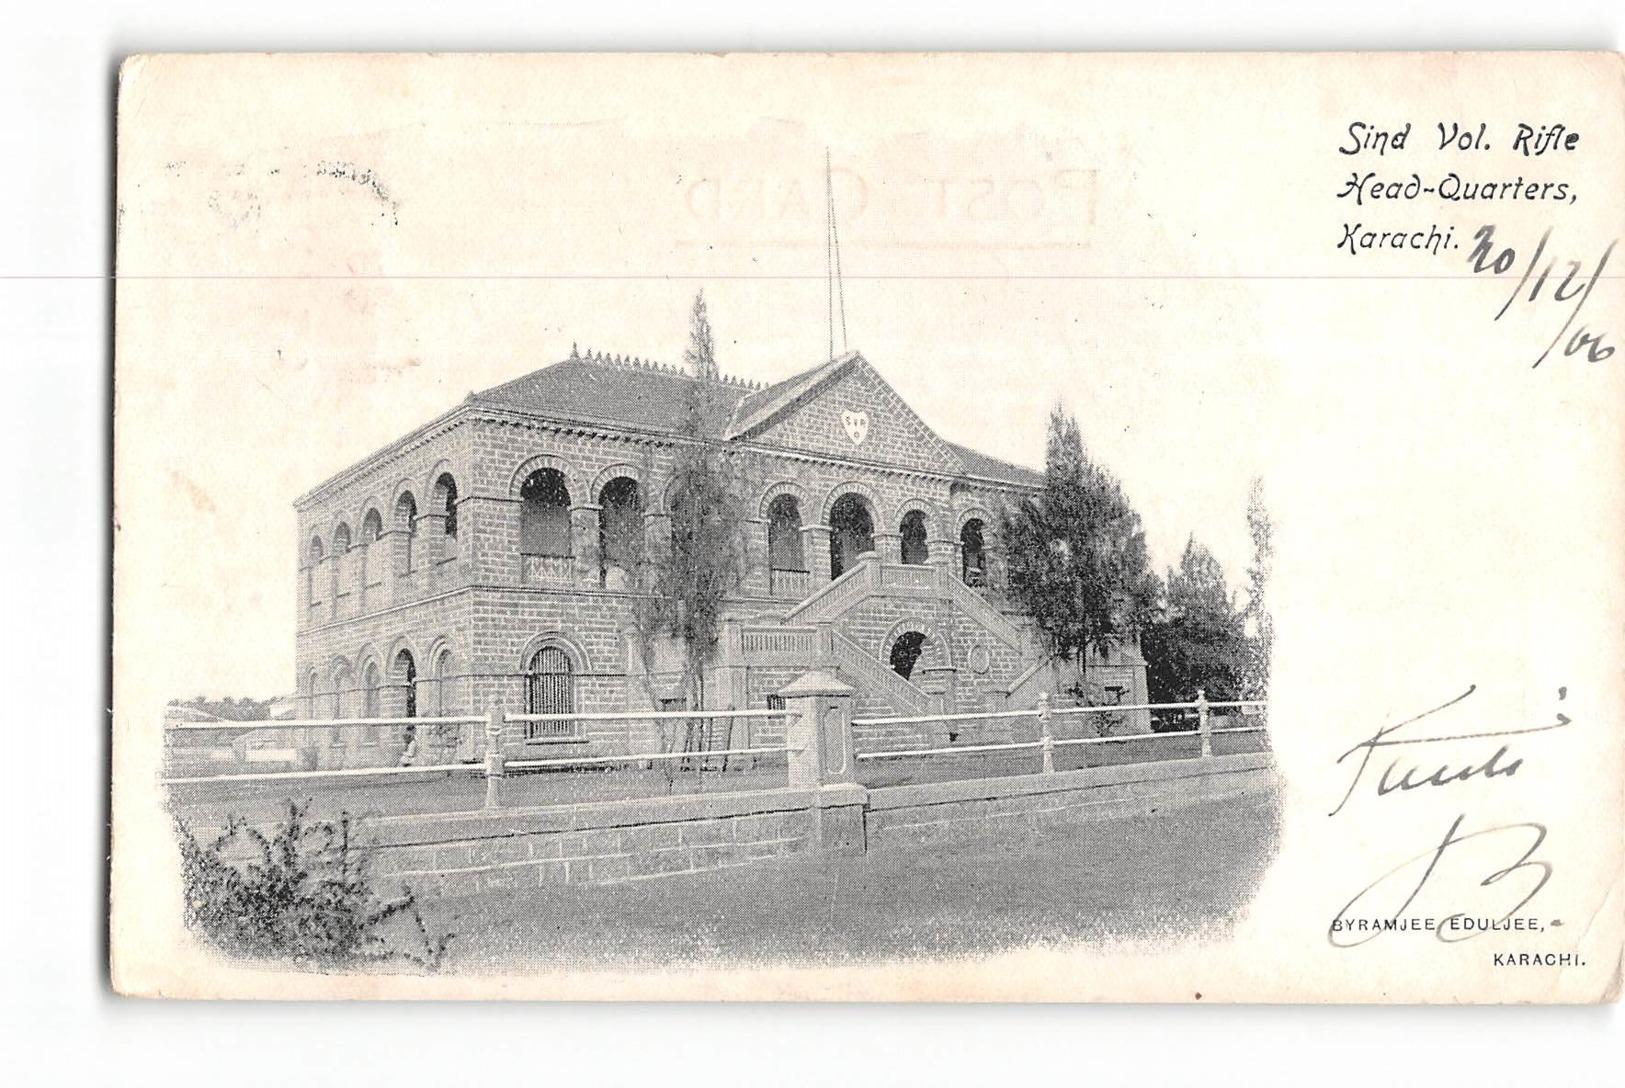 17647 SIND VOL. RIFLE HEAD-QUARTERS KARACHI - KIMARI POSTMARK - Pakistan